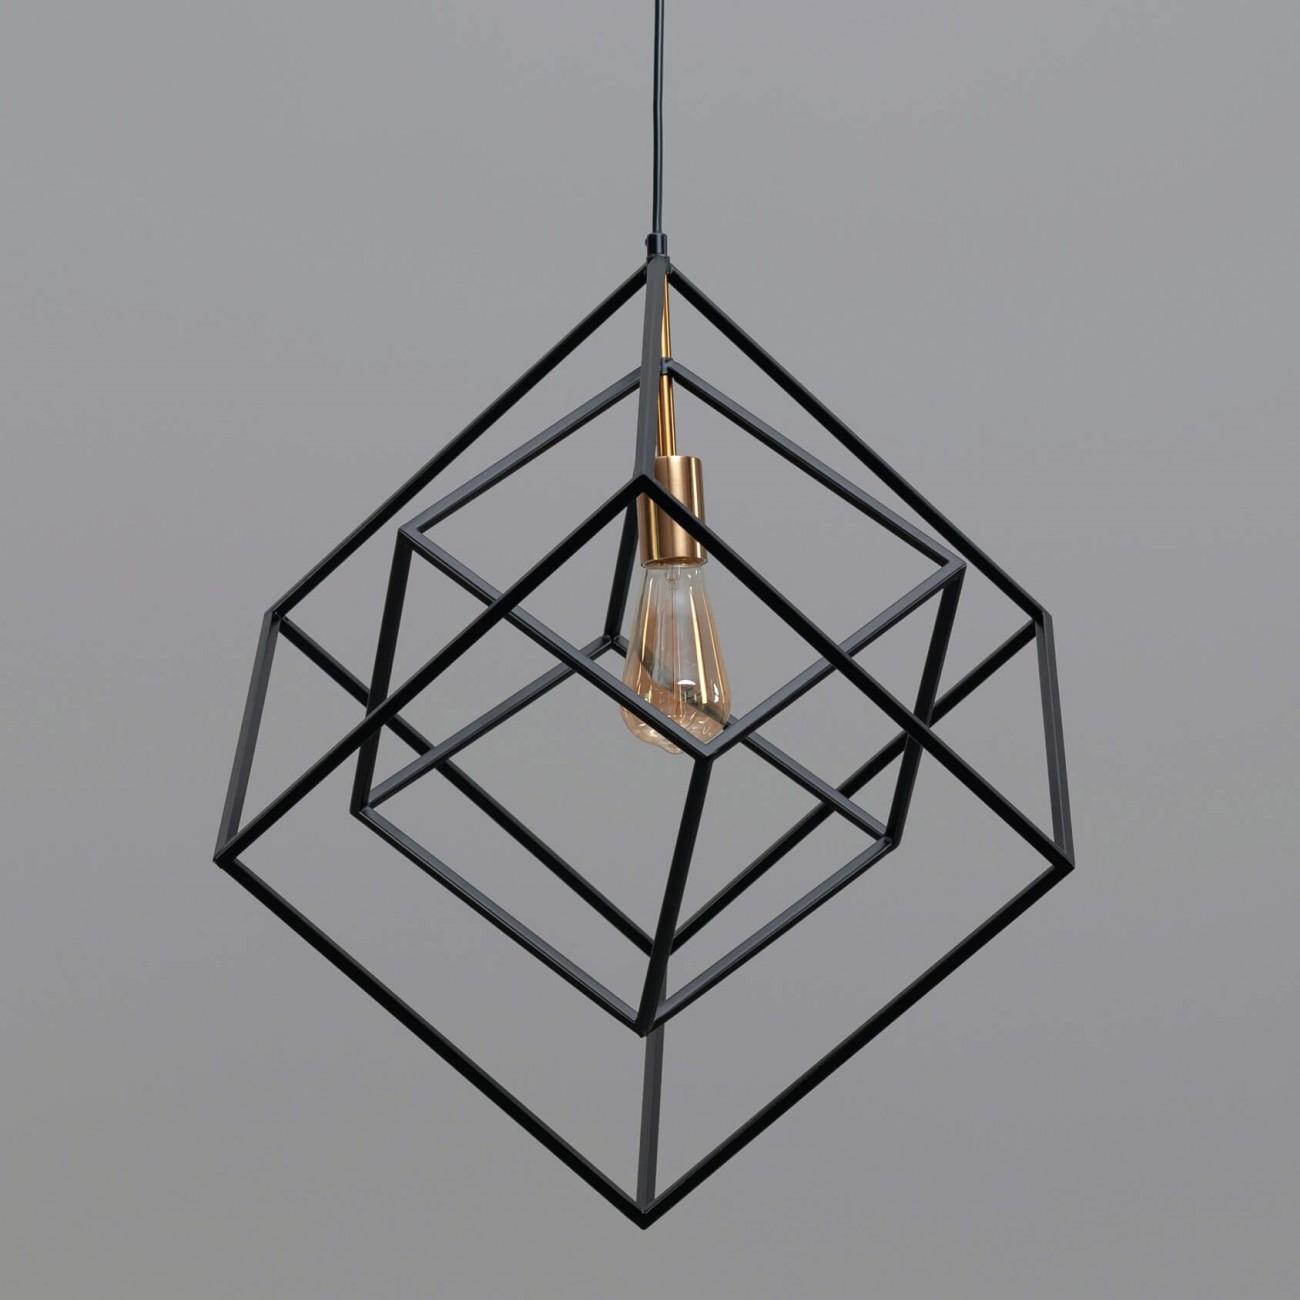 Interlocked Metal Framework Pendant Light